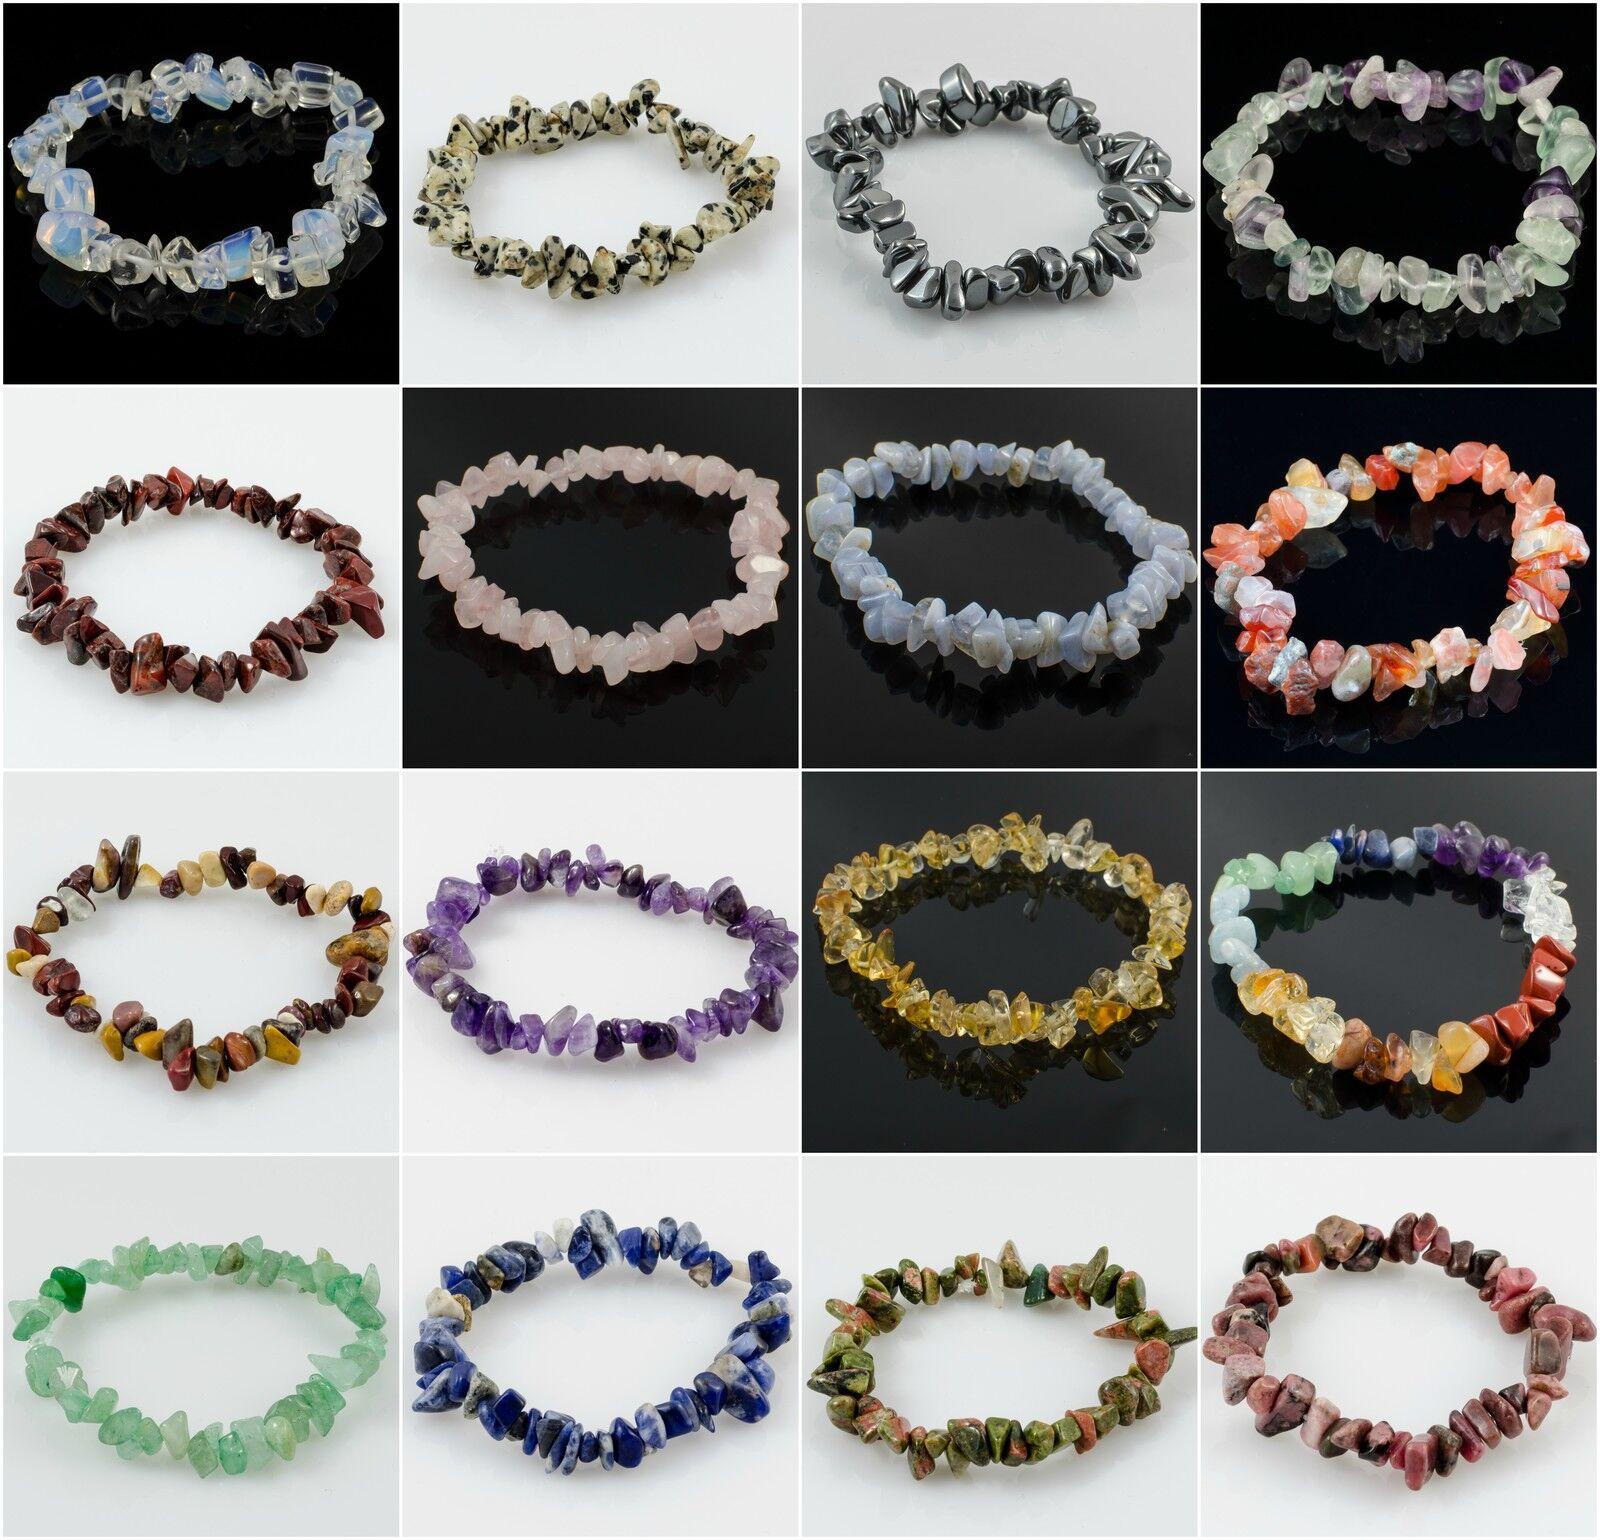 Jewellery - Crystal Chip Gemstone Bead Bracelet New Age Healing Chakra Reiki Jewellery Gift